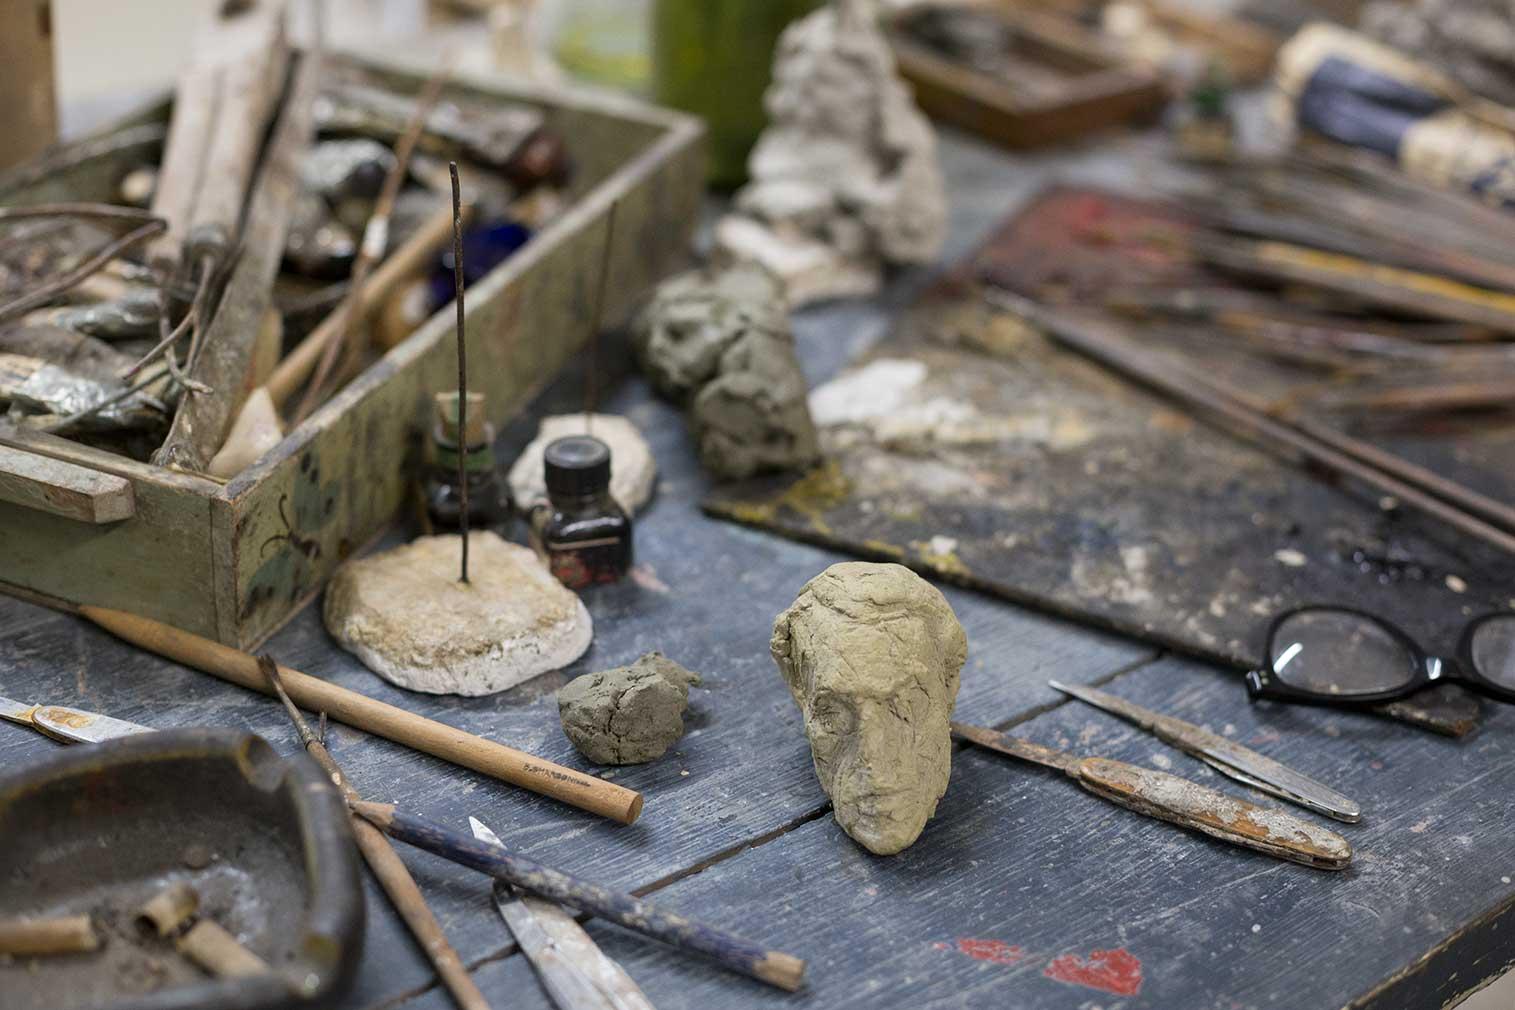 Reconstruction of the studio (c) Giacometti Estate (Giacometti Foundation + ADAGP) Paris 2018